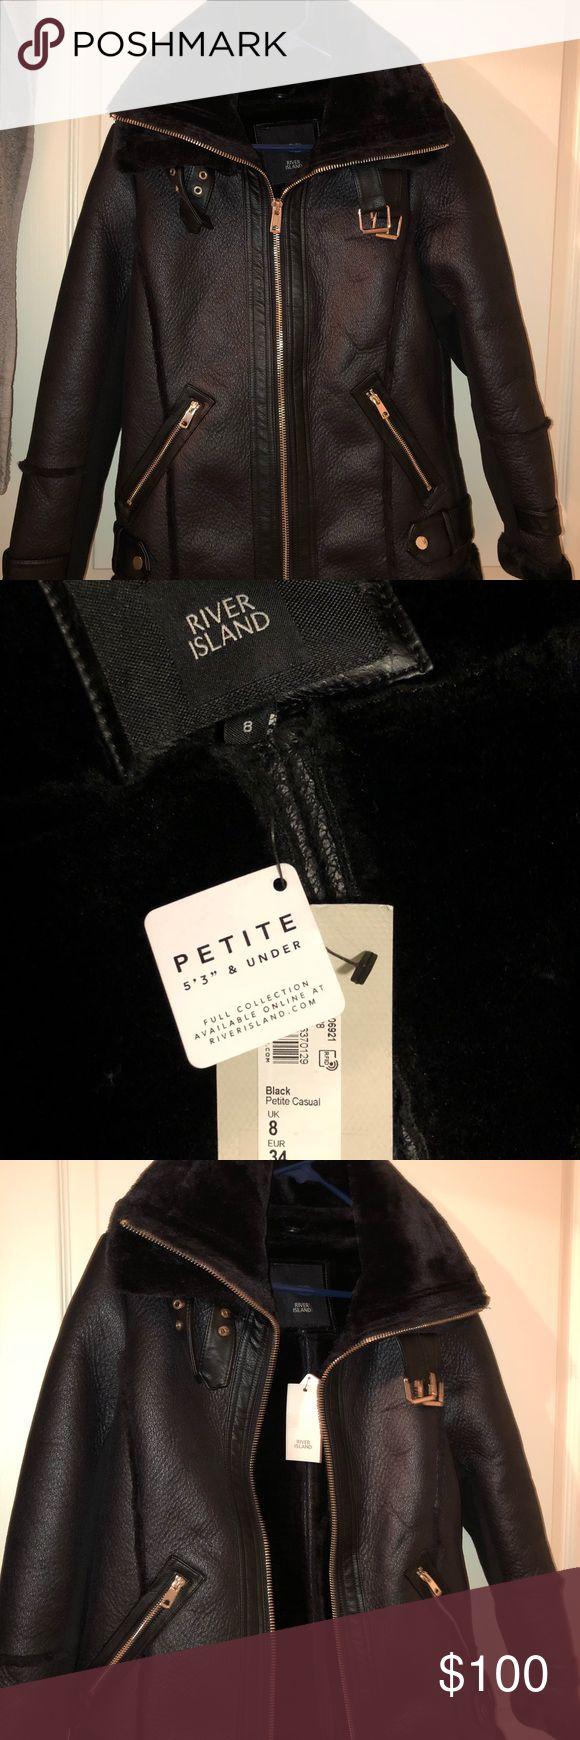 River island moto jacket Black, long, double collar